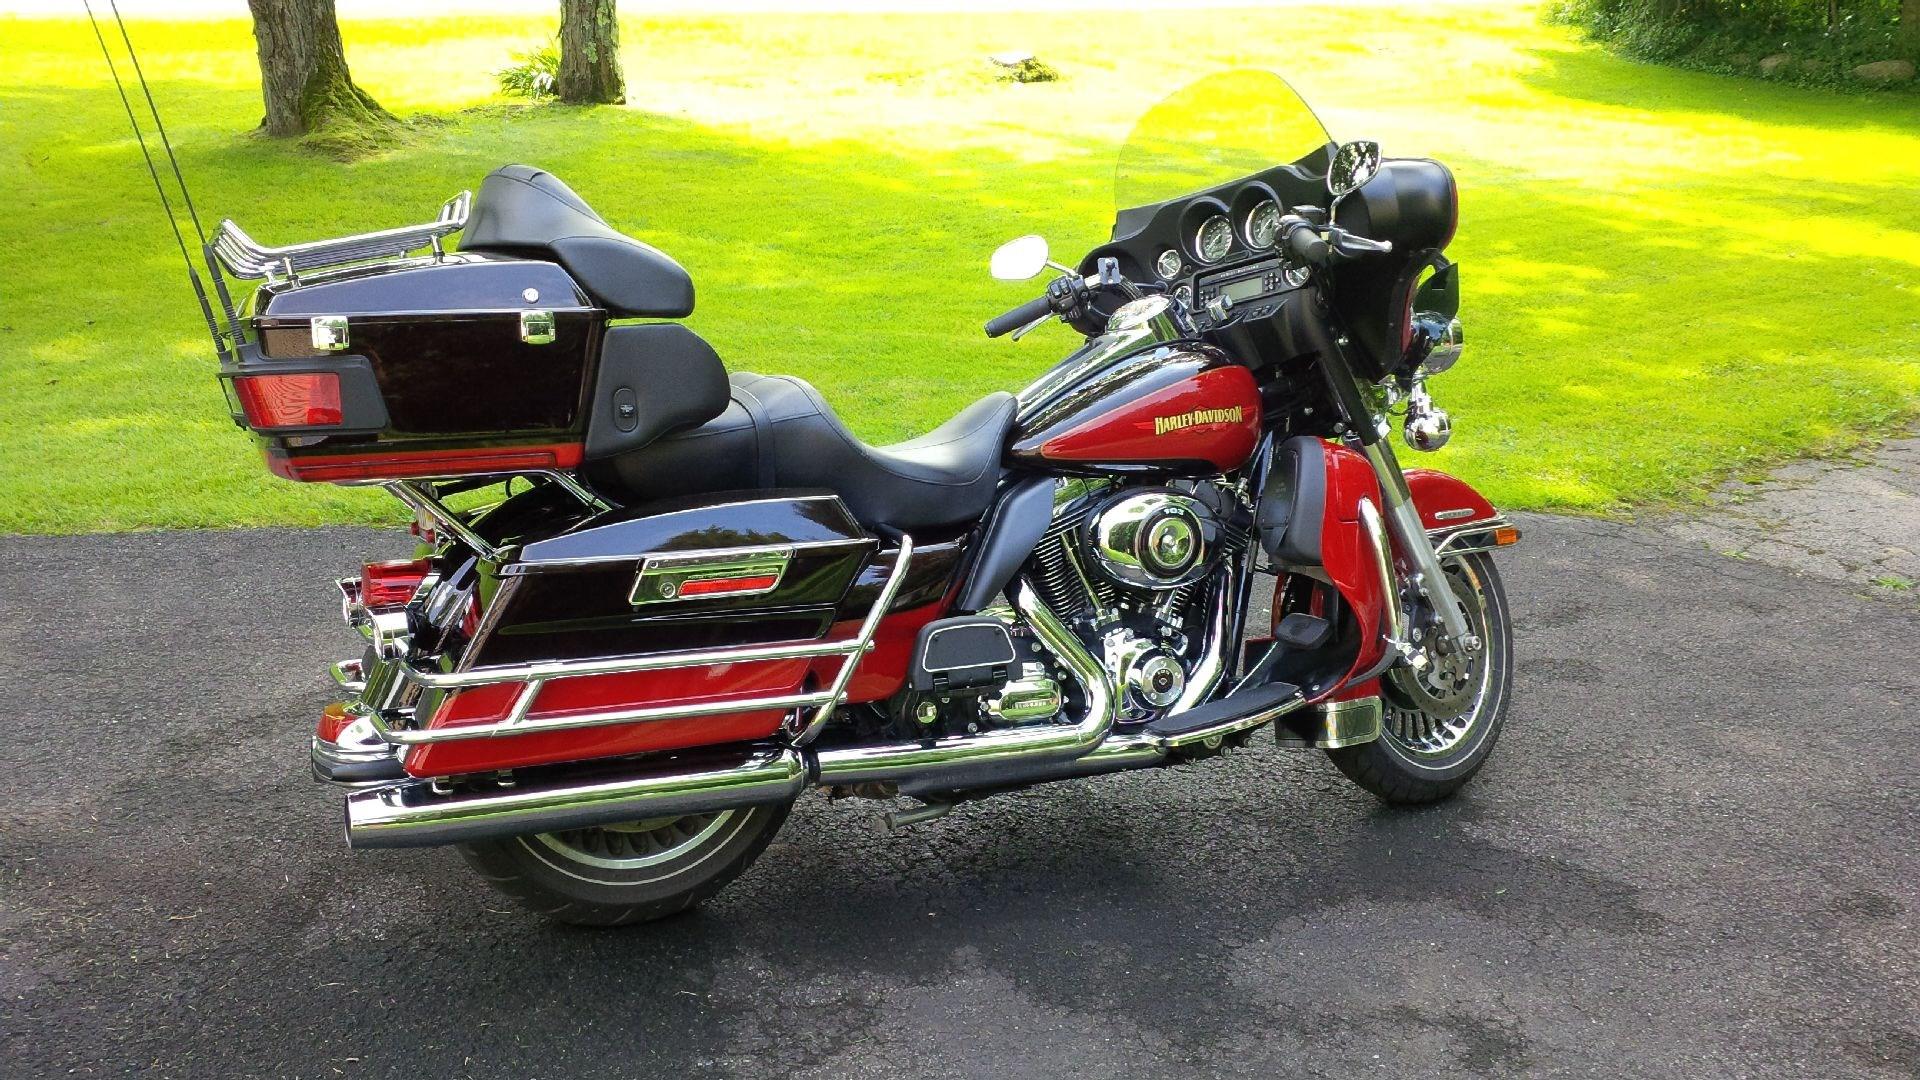 Harley Davidson Electra Glide For Sale Tulsa Ok >> 2010 Harley-Davidson® FLHTK Electra Glide® Ultra Limited (Merlot/Red), Rome, New York (703503 ...